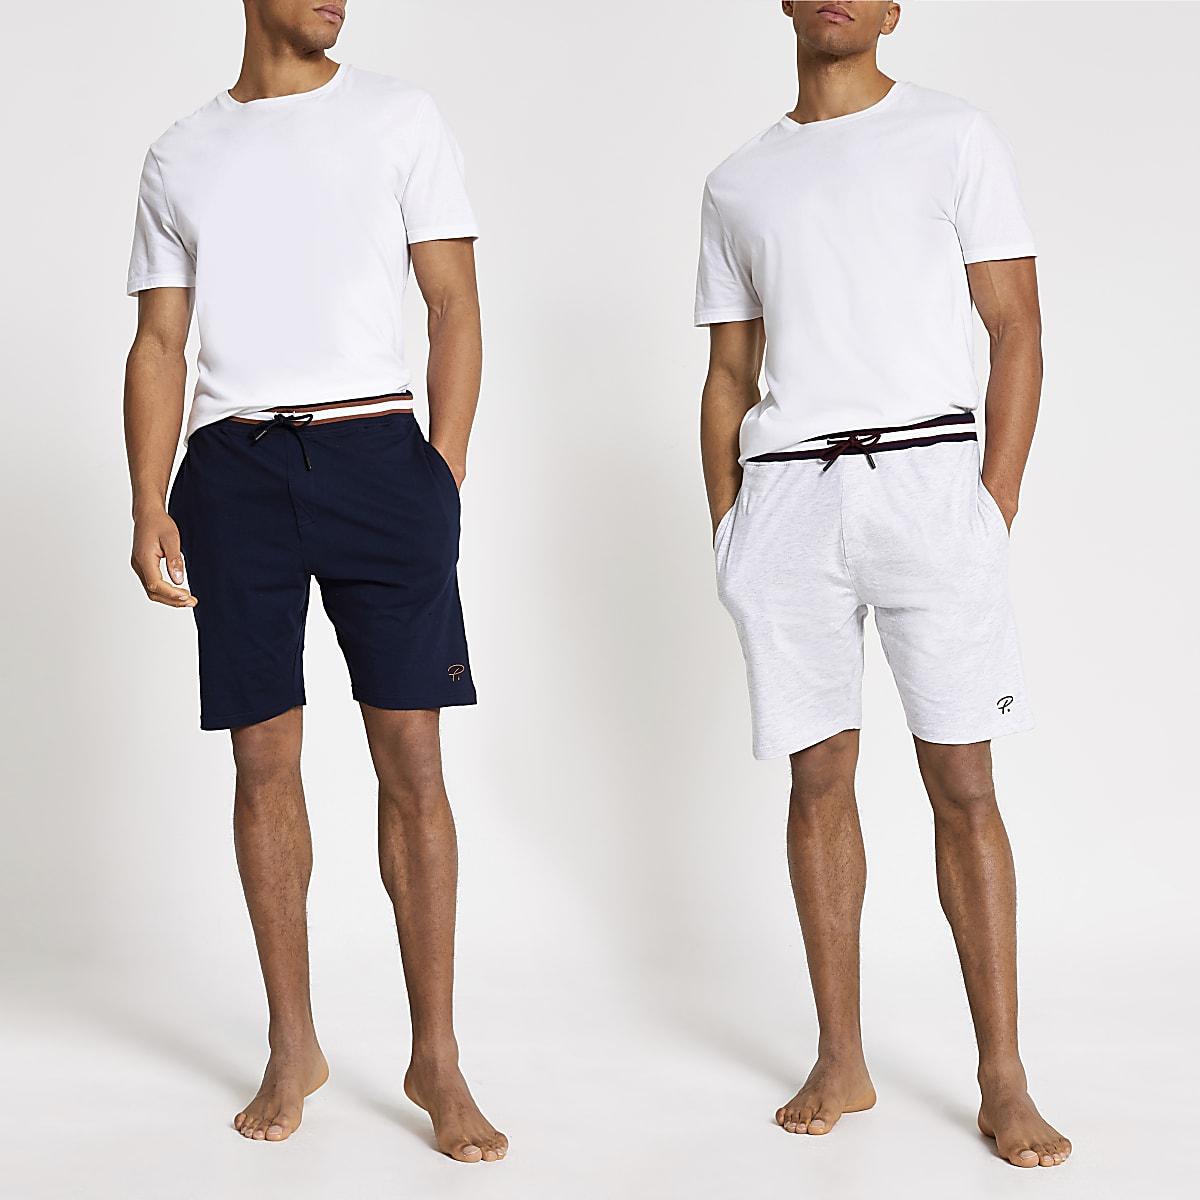 Grey Prolific loungewear shorts 2 pack